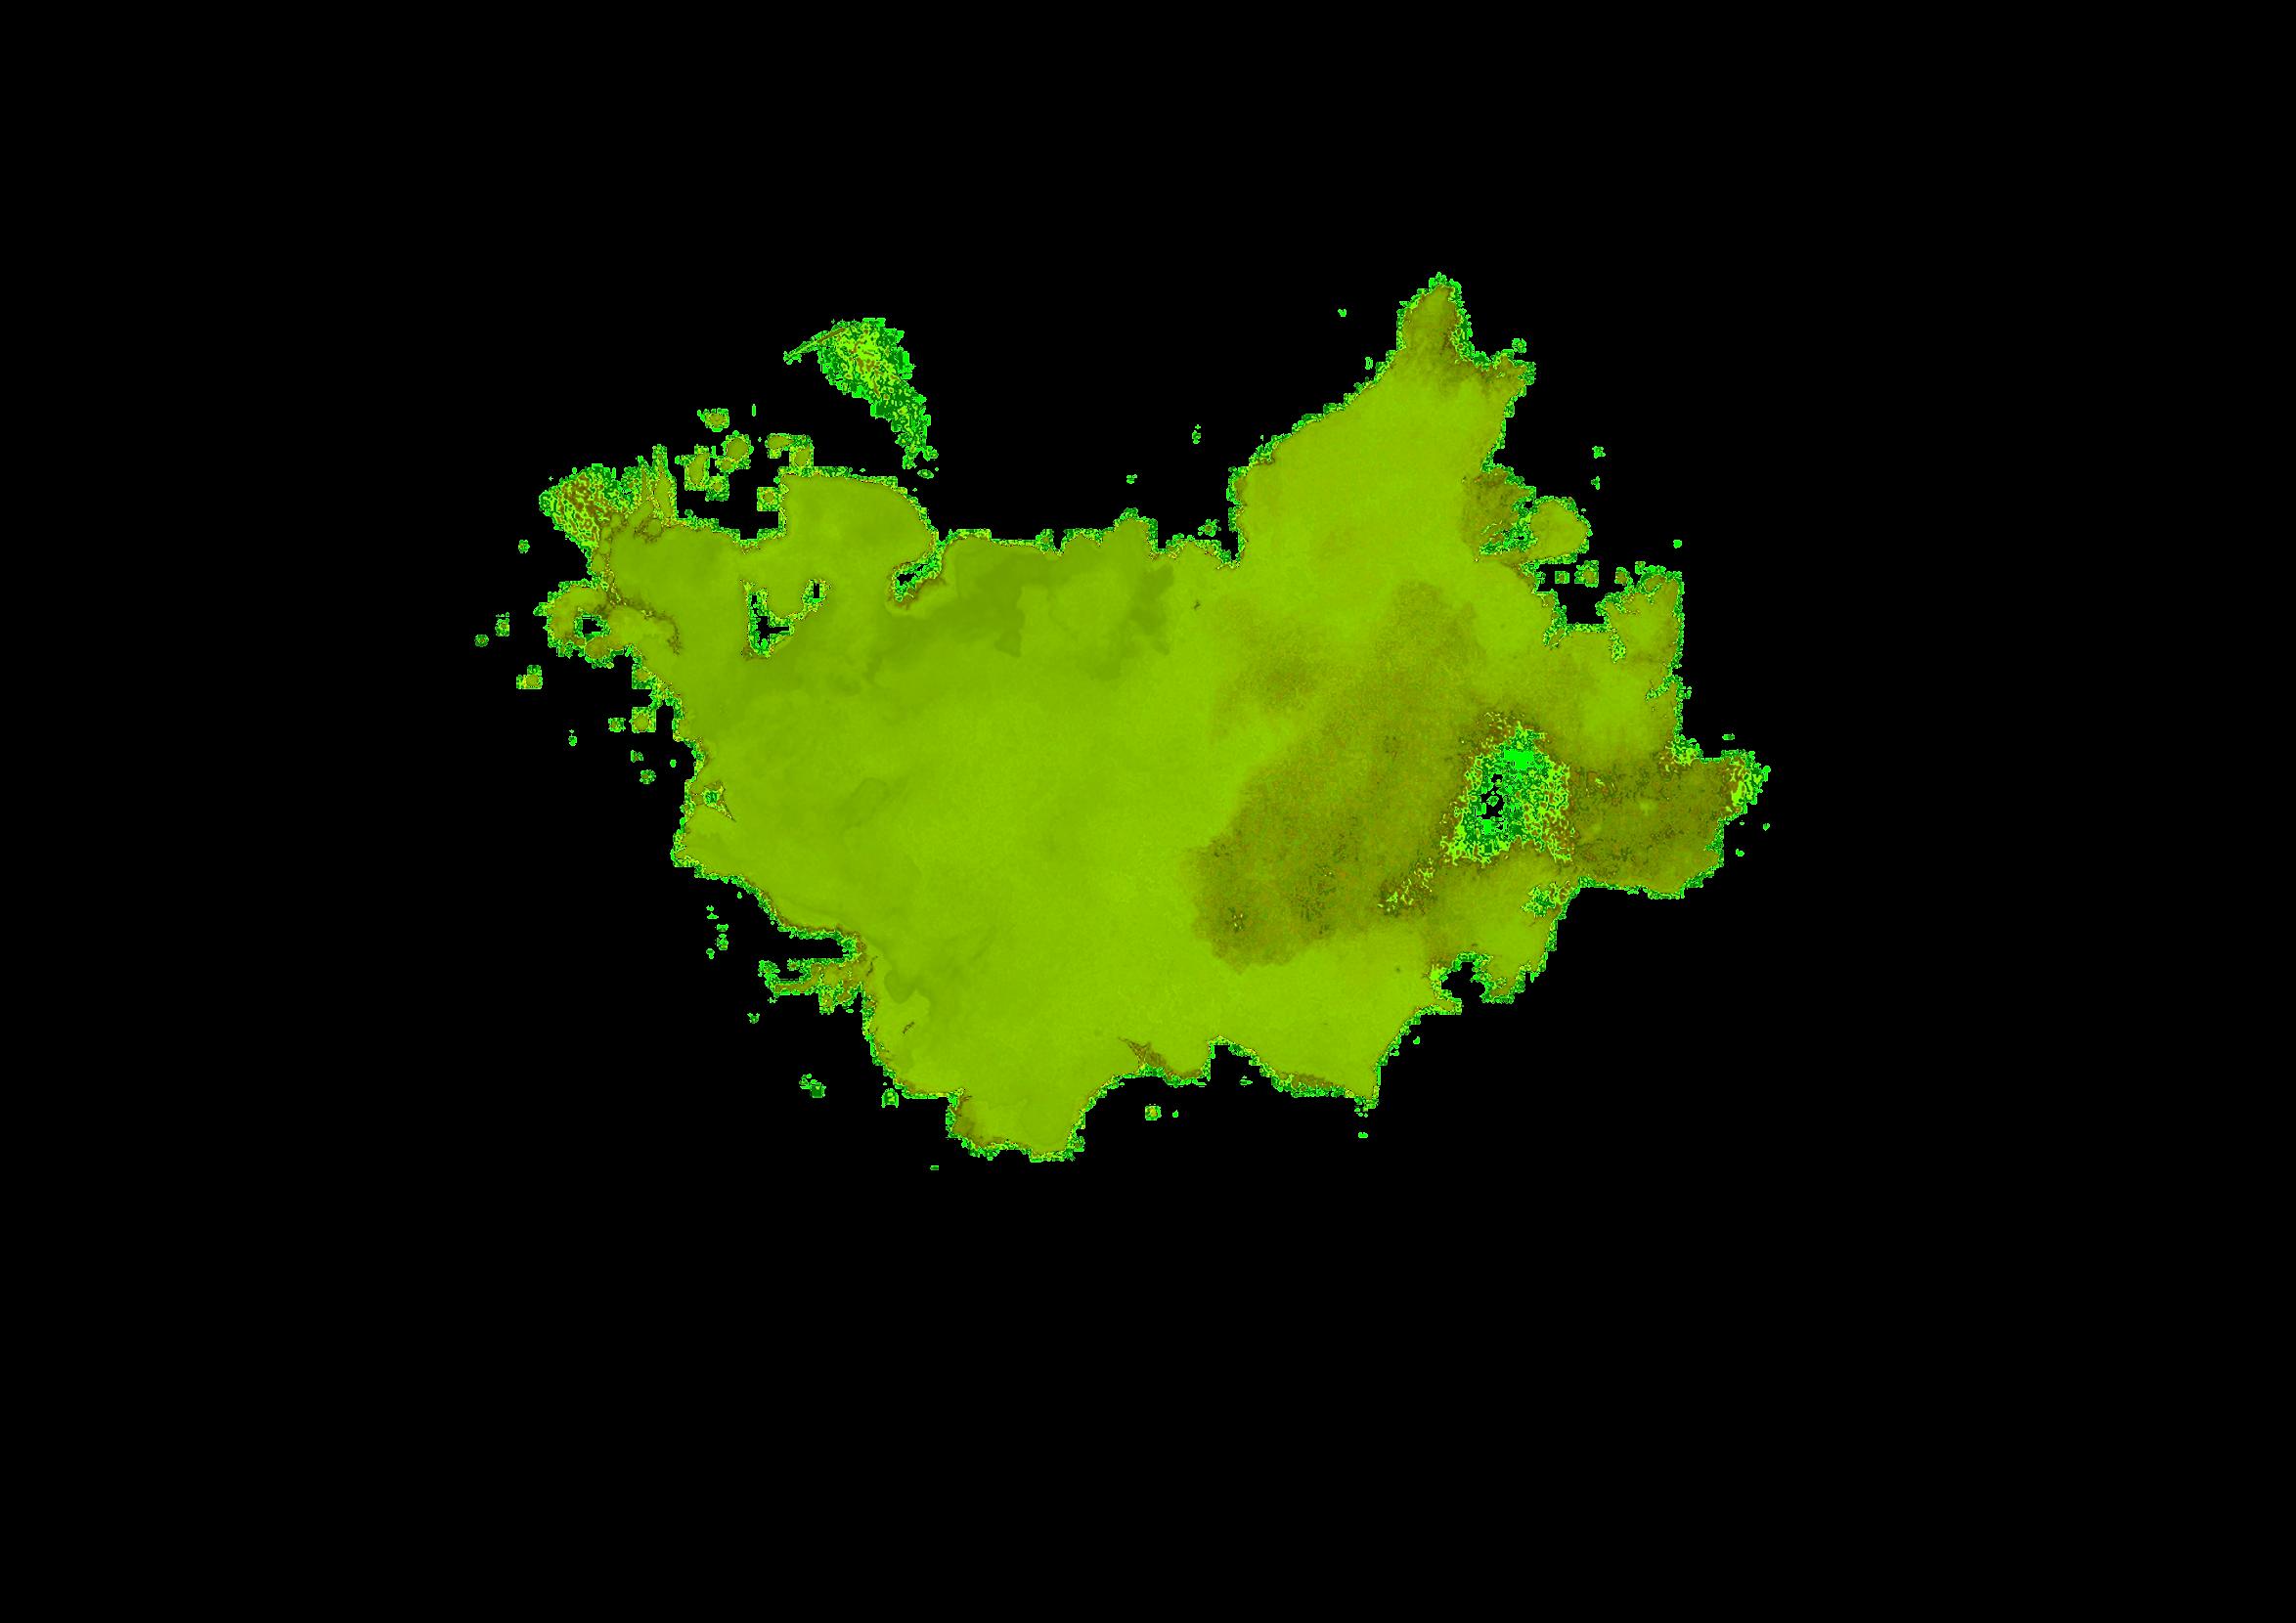 Wasserfarbe-Gr%25C3%25BCn_edited_edited.